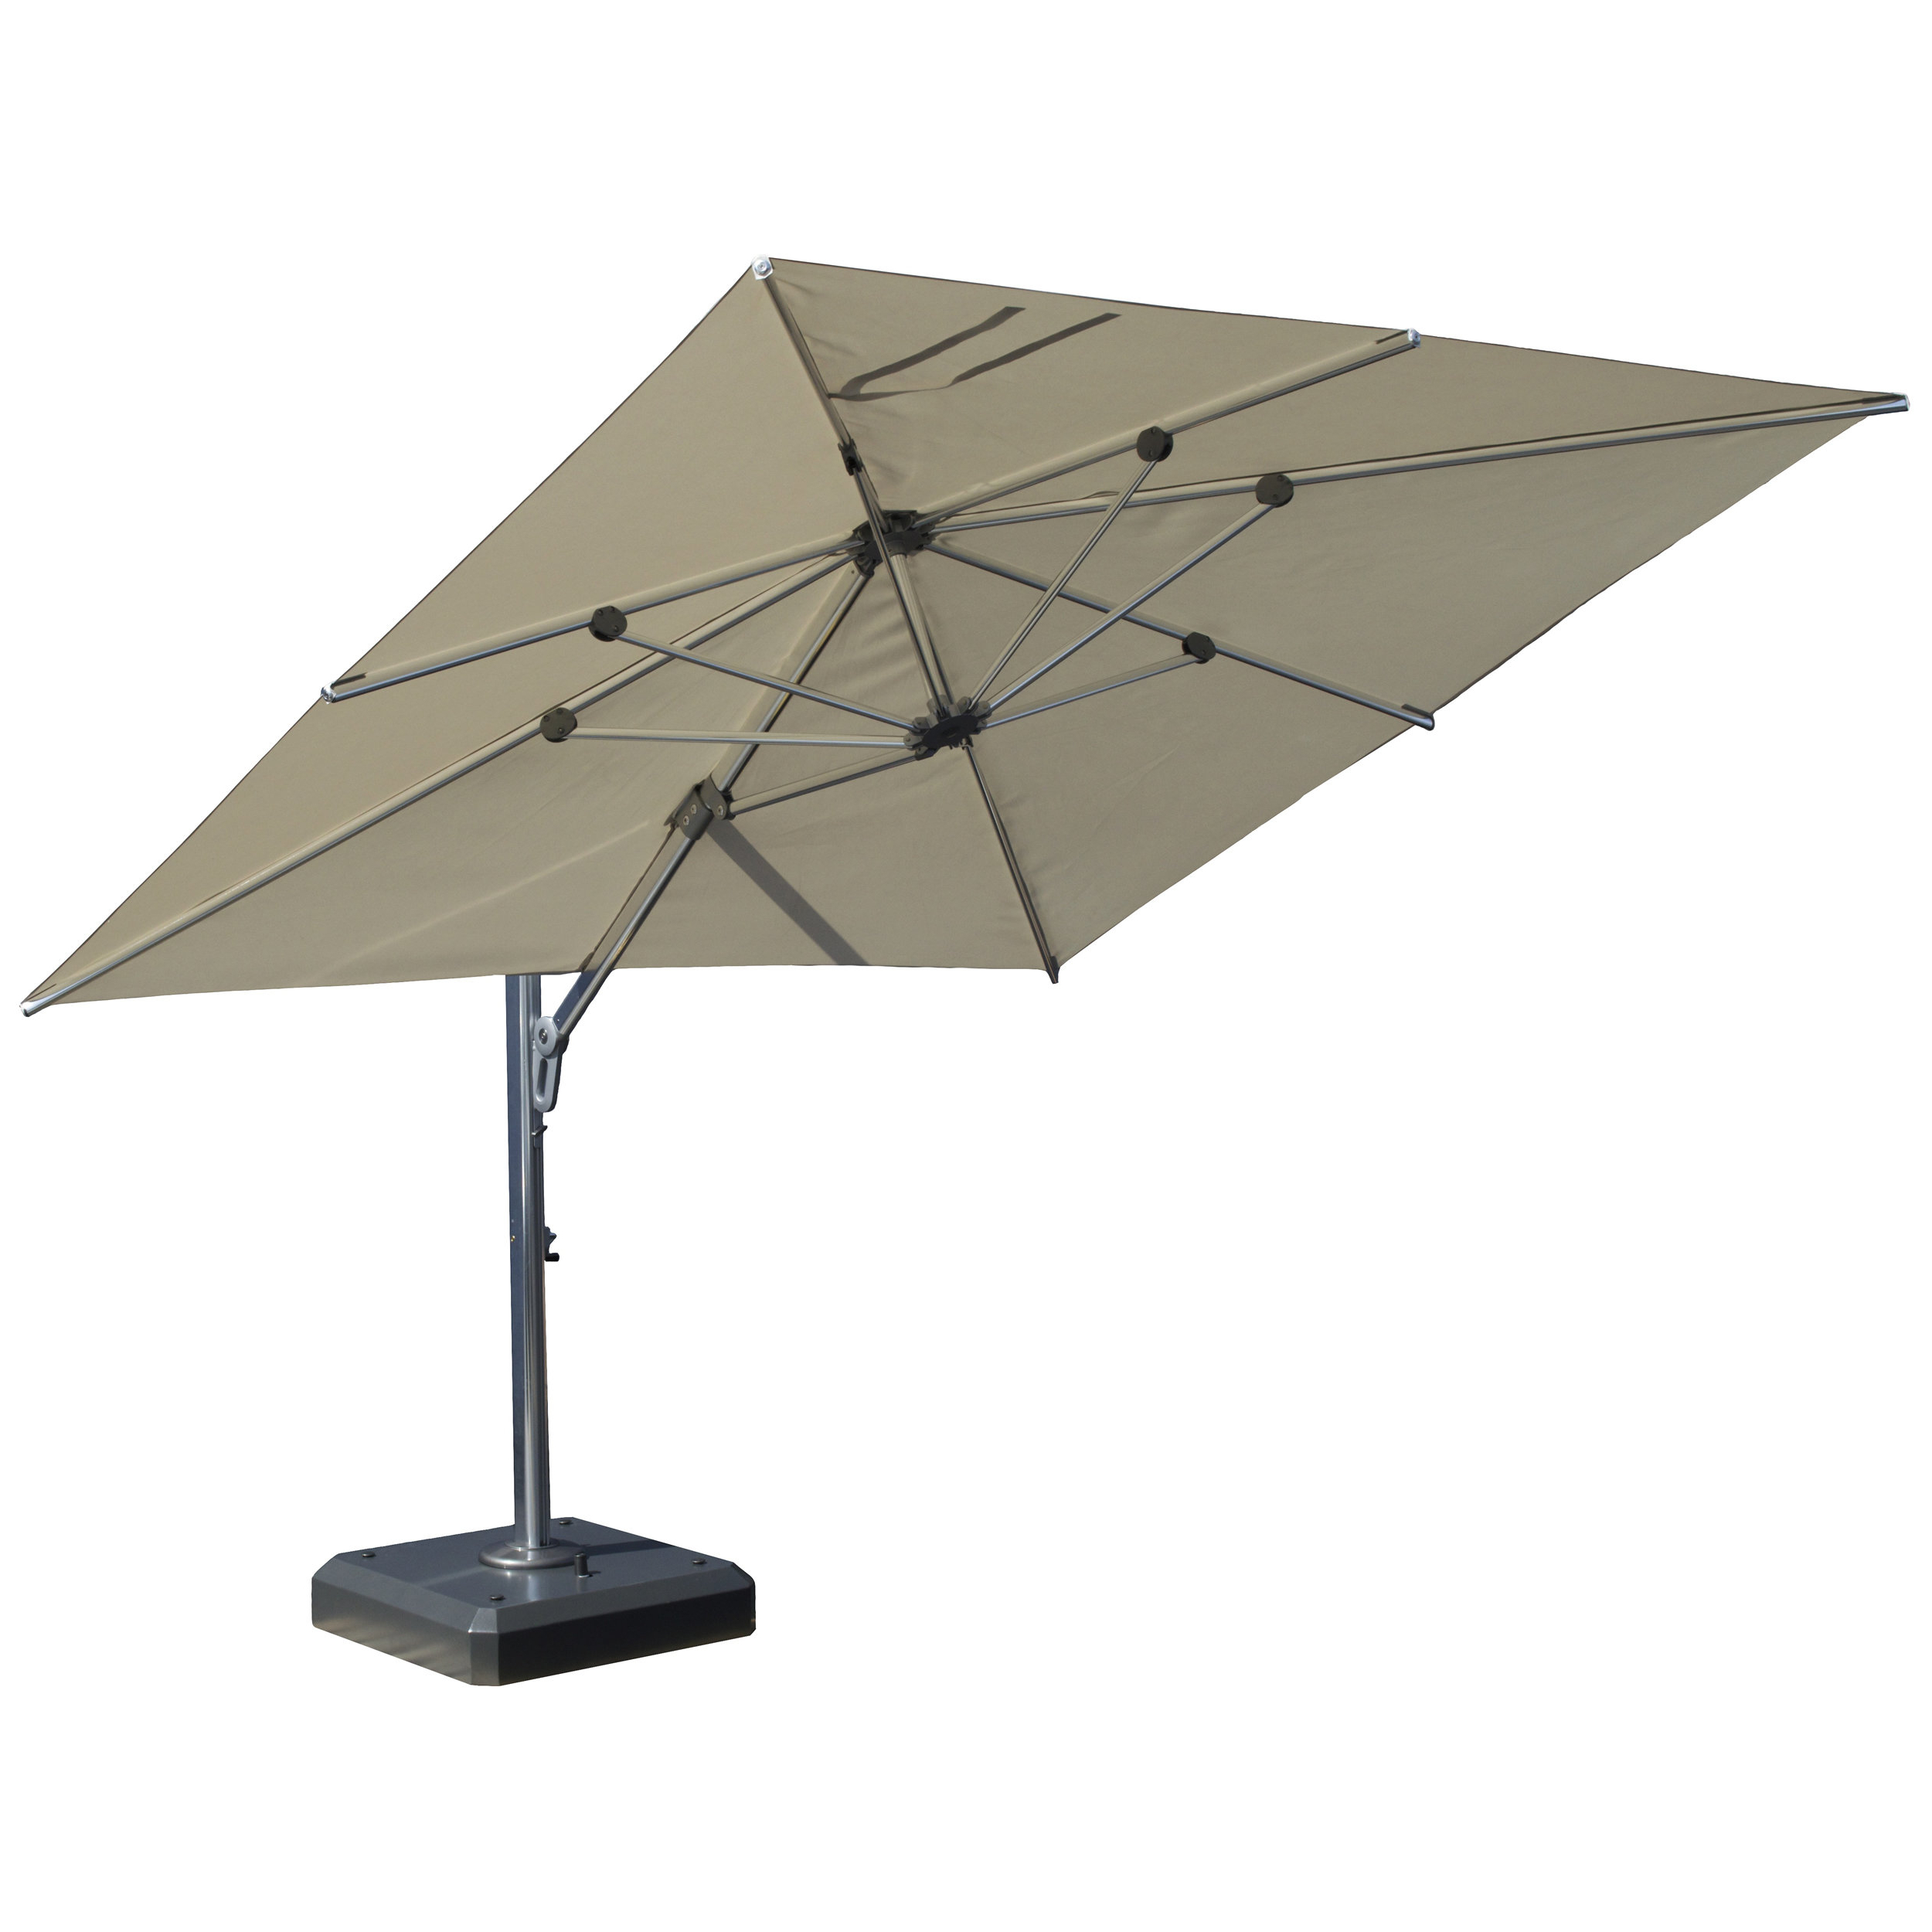 Favorite Nasiba Square Cantilever Sunbrella Umbrellas Intended For 10'x12' Rectangular Cantilever Umbrella (View 14 of 20)